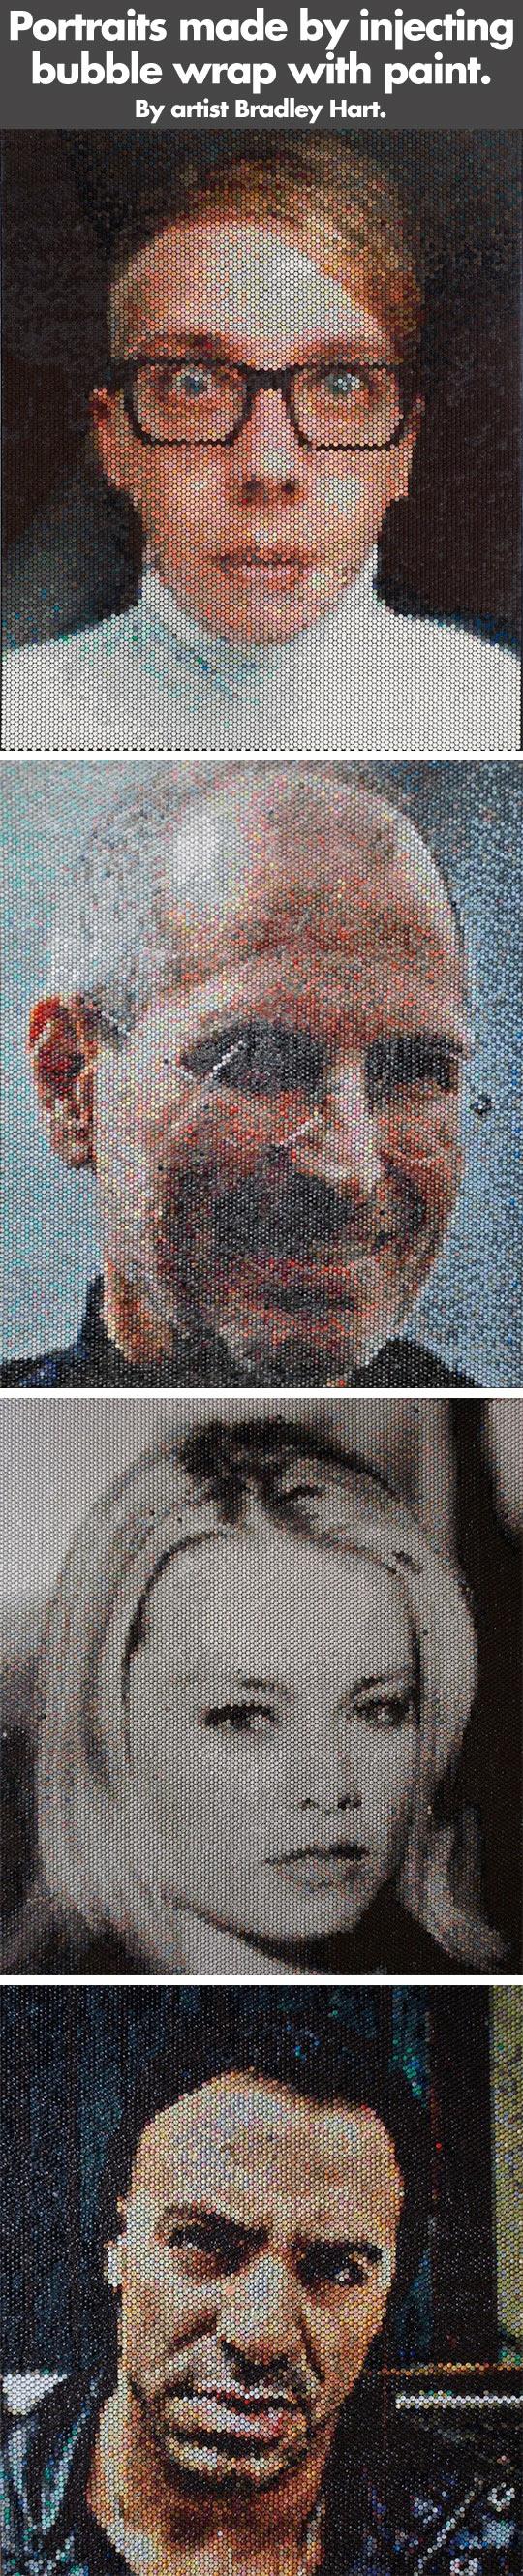 cool-Portraits-injecting-bubble-wrap-paint